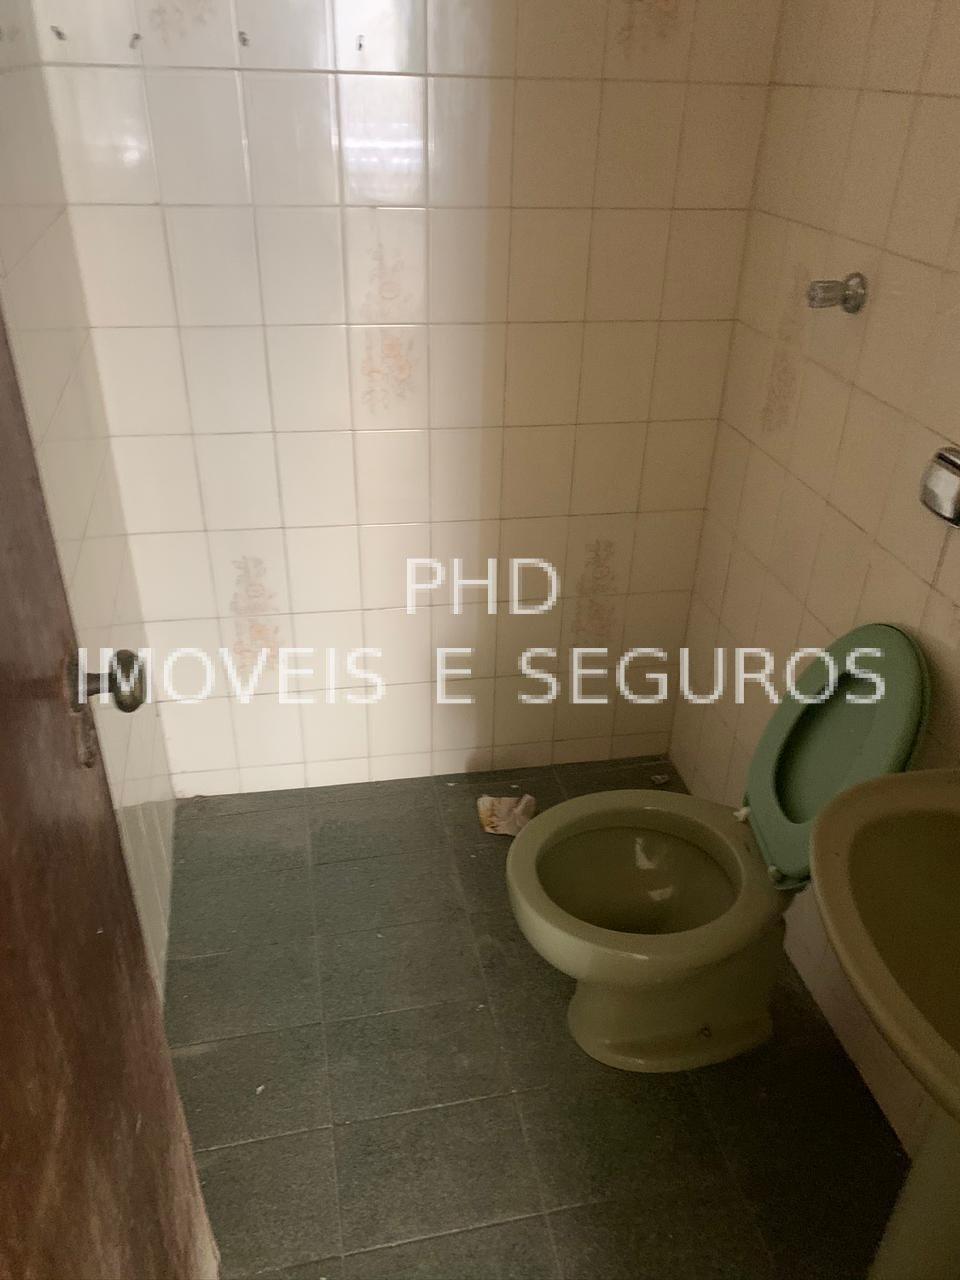 2 - Imóvel de Código PHD716